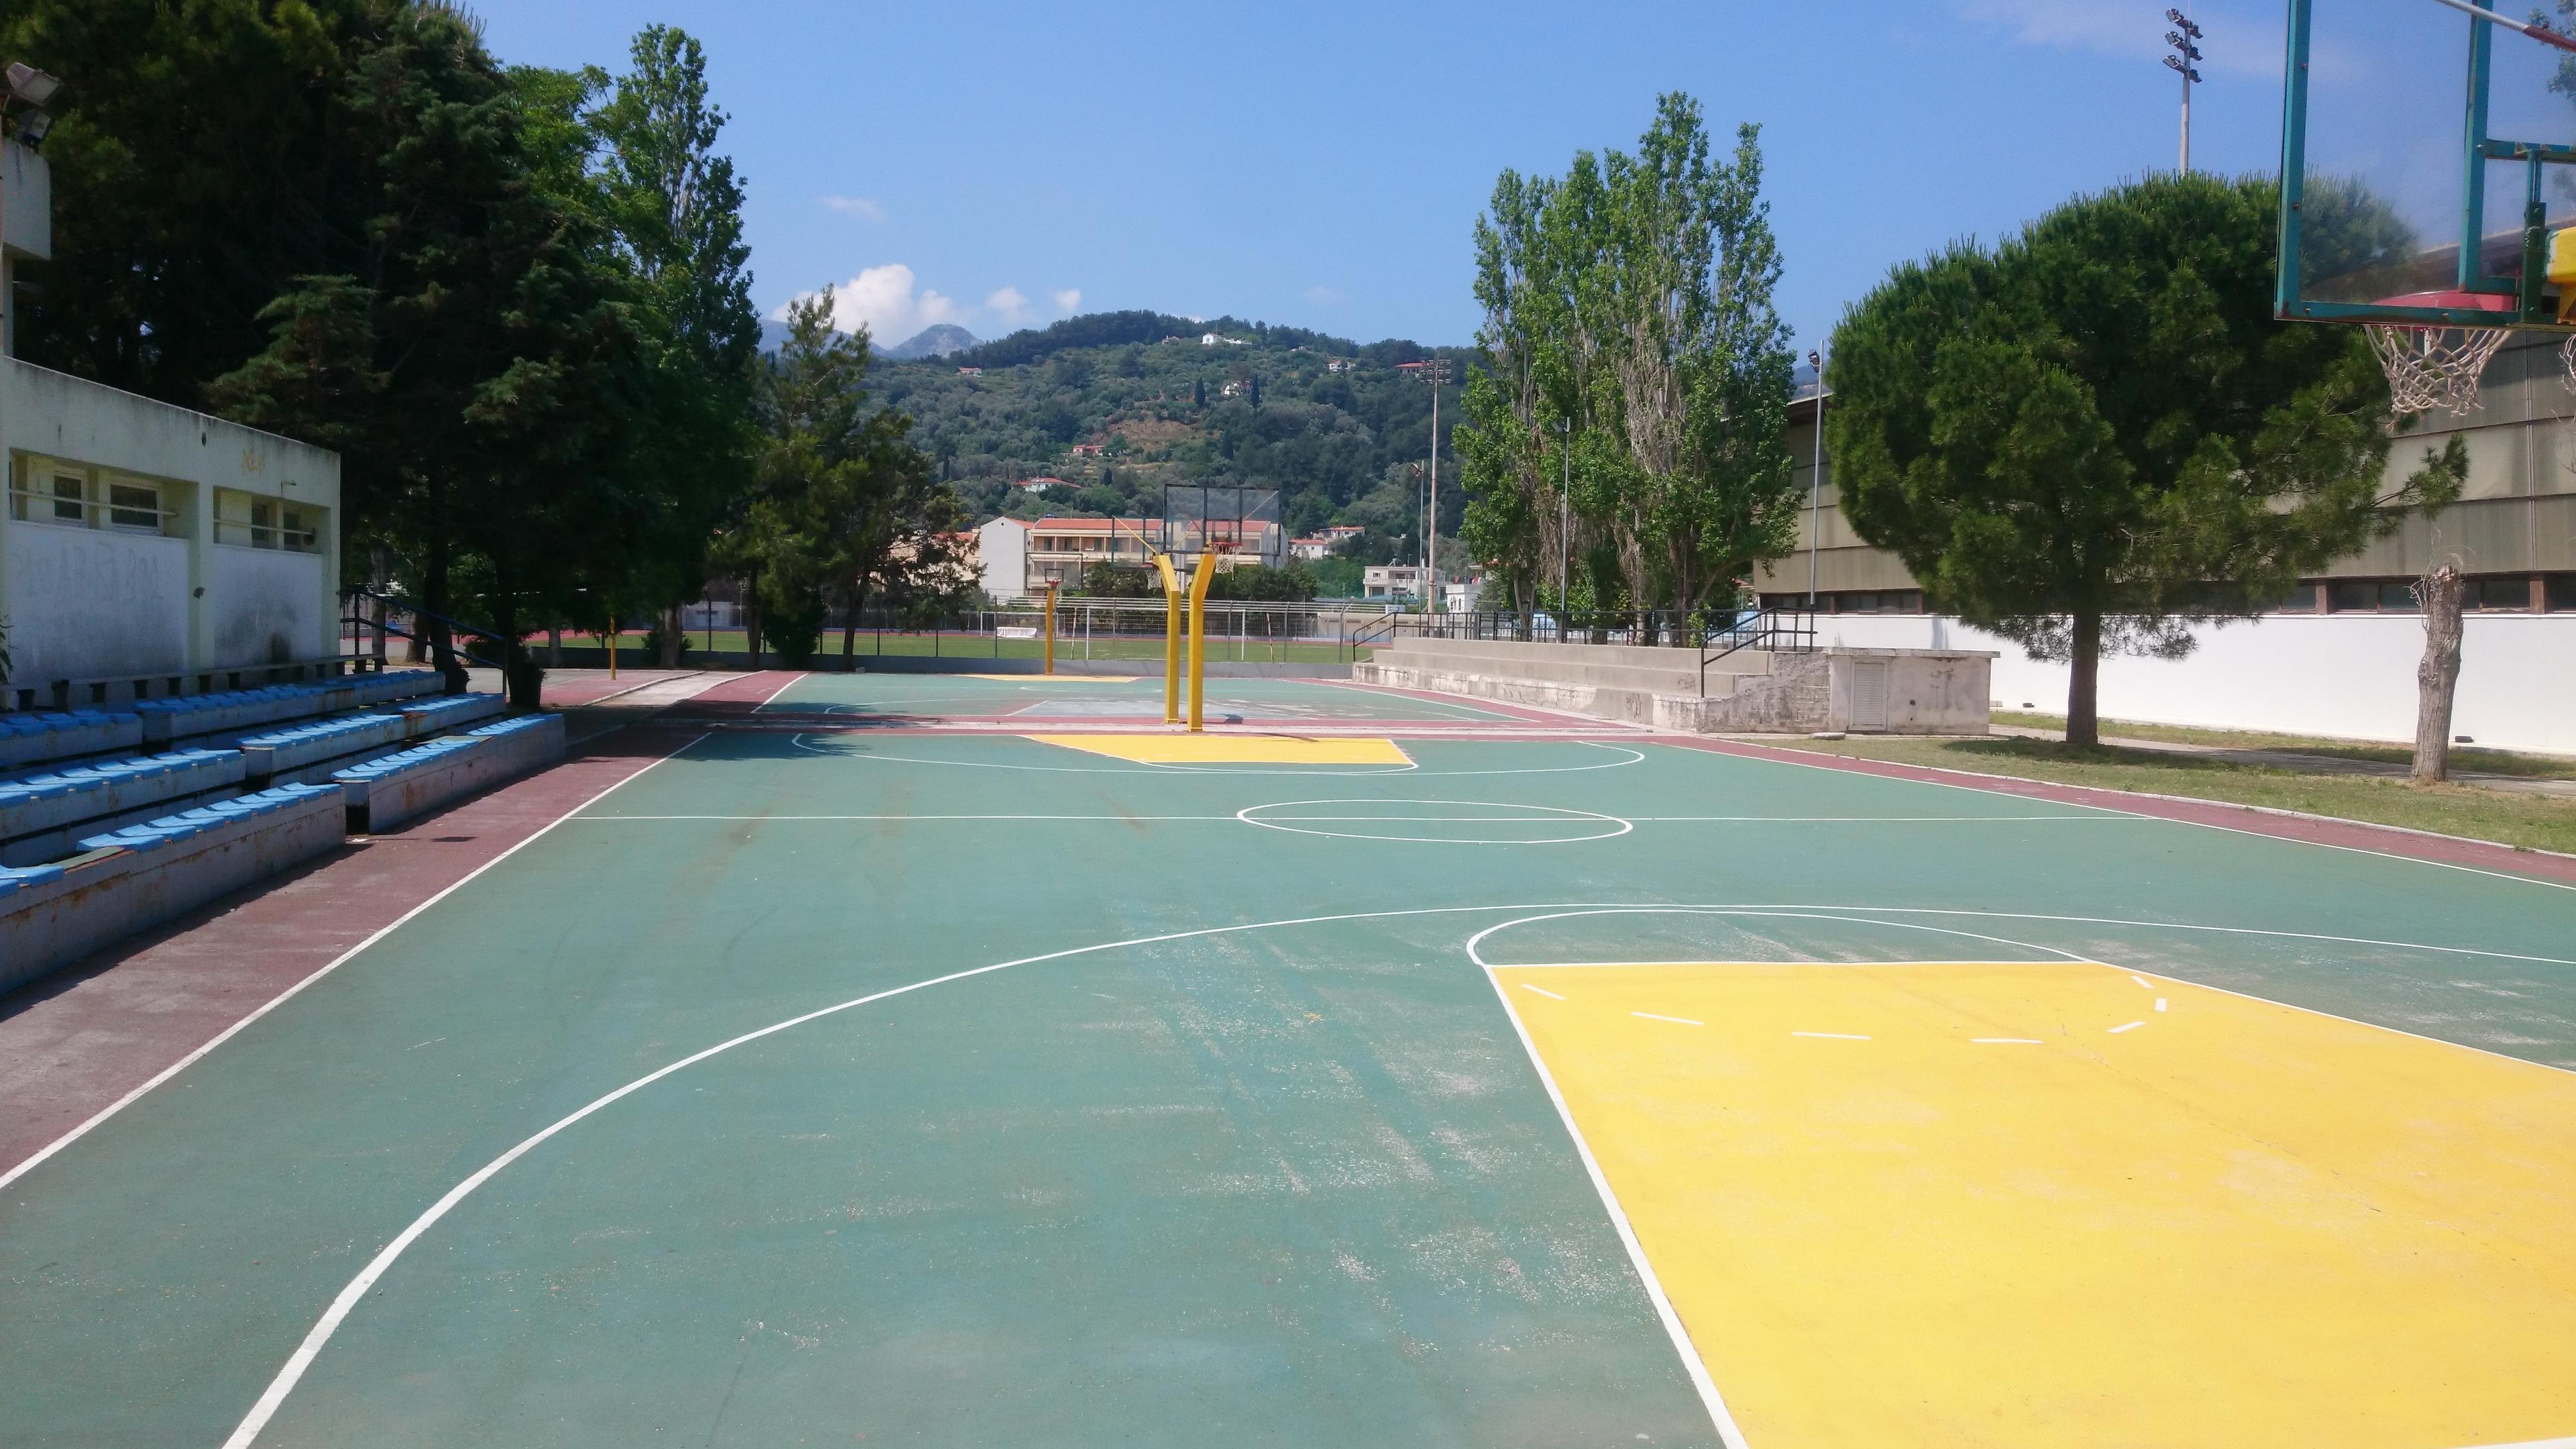 File:Outdoor Basketball Court In Karlovasi, Samos